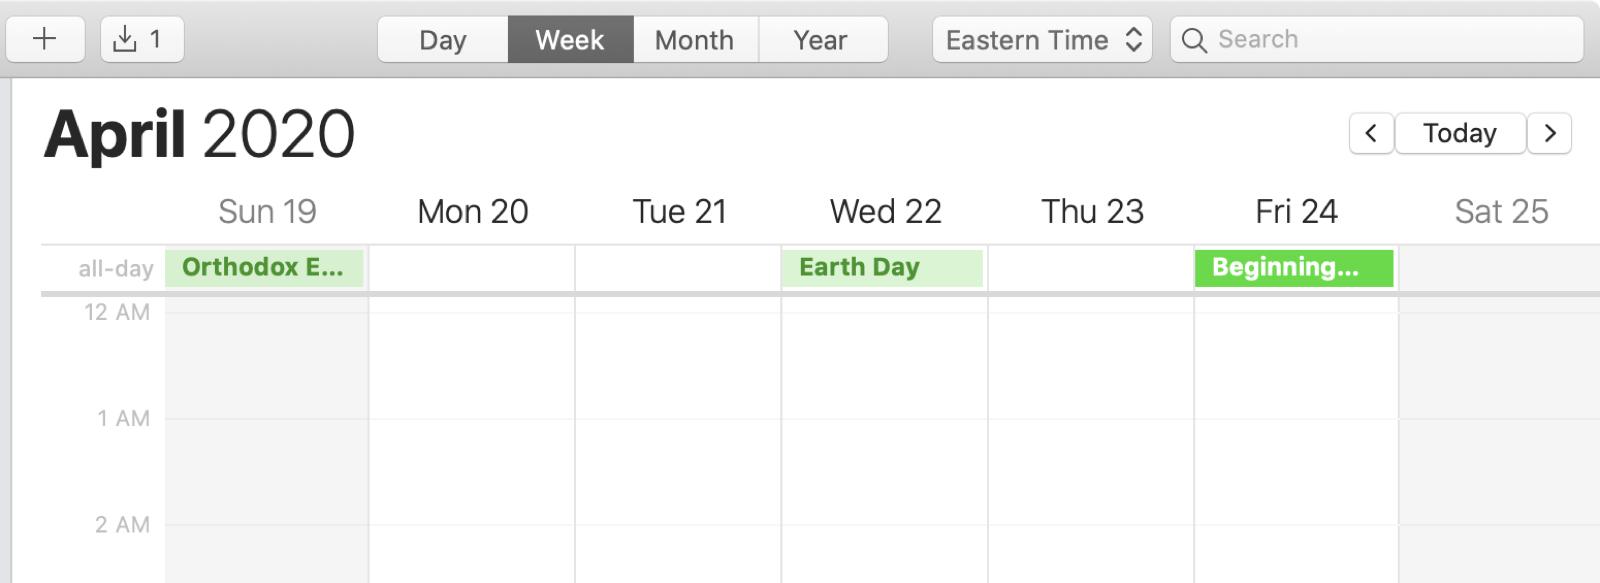 Calendar Mac All Day Events